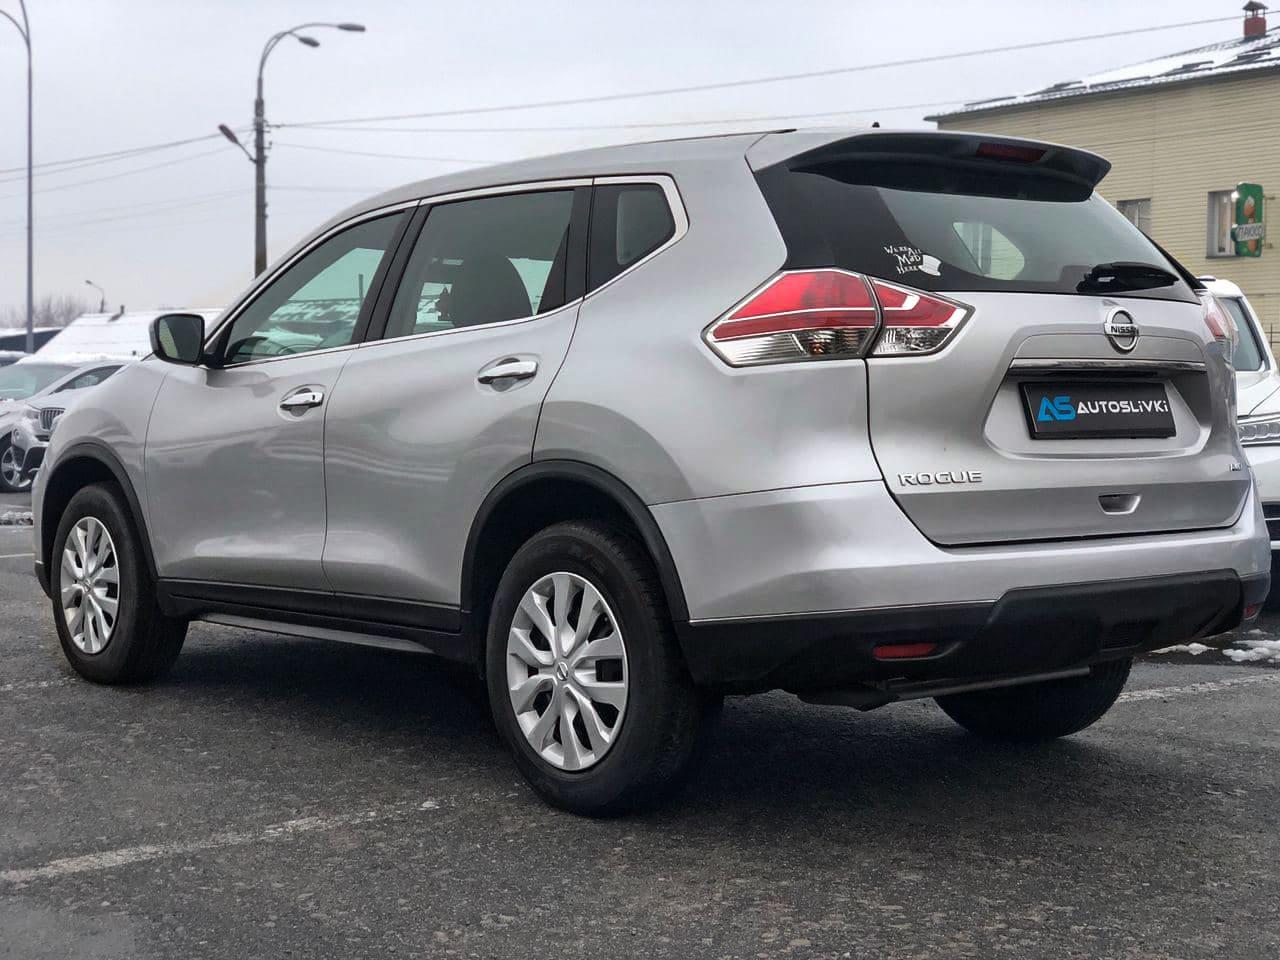 2015 Nissan ROGUE | Vin: KNMAT2MV0FP588270